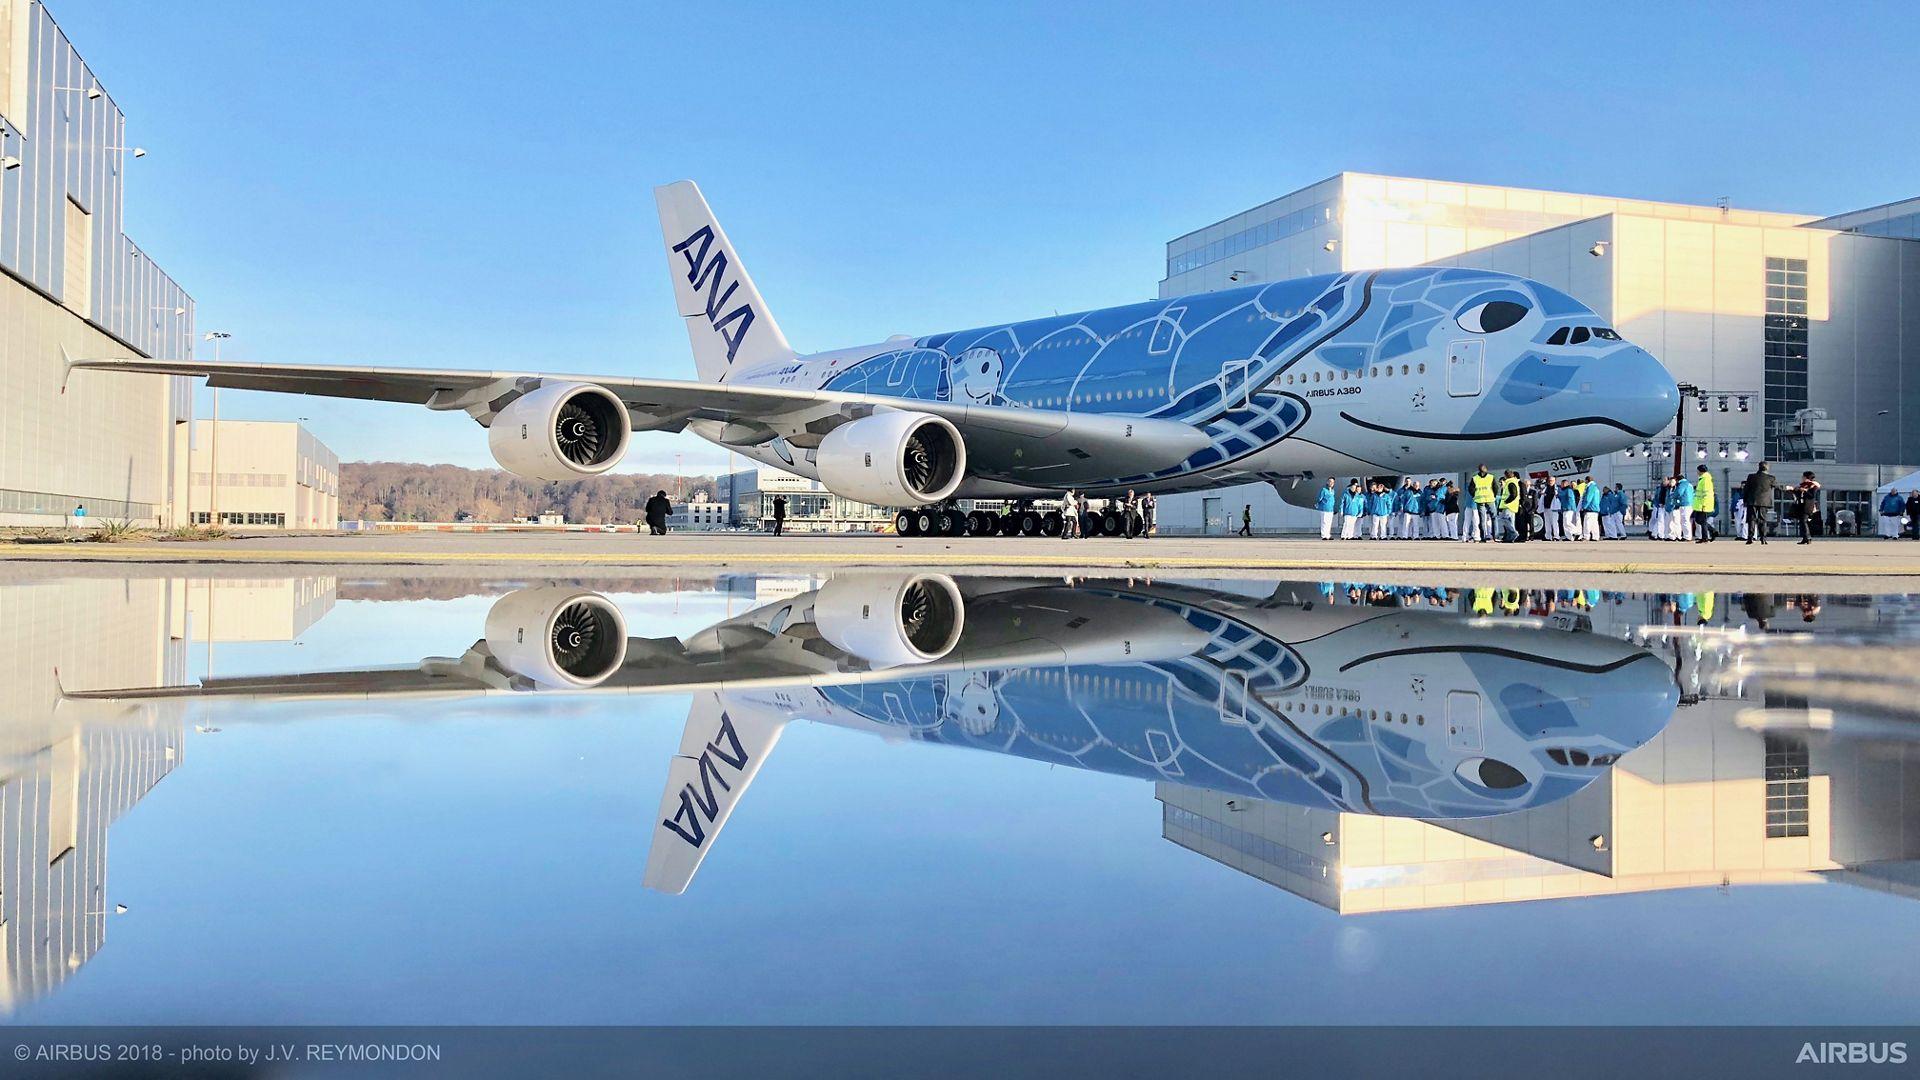 Airbus Home